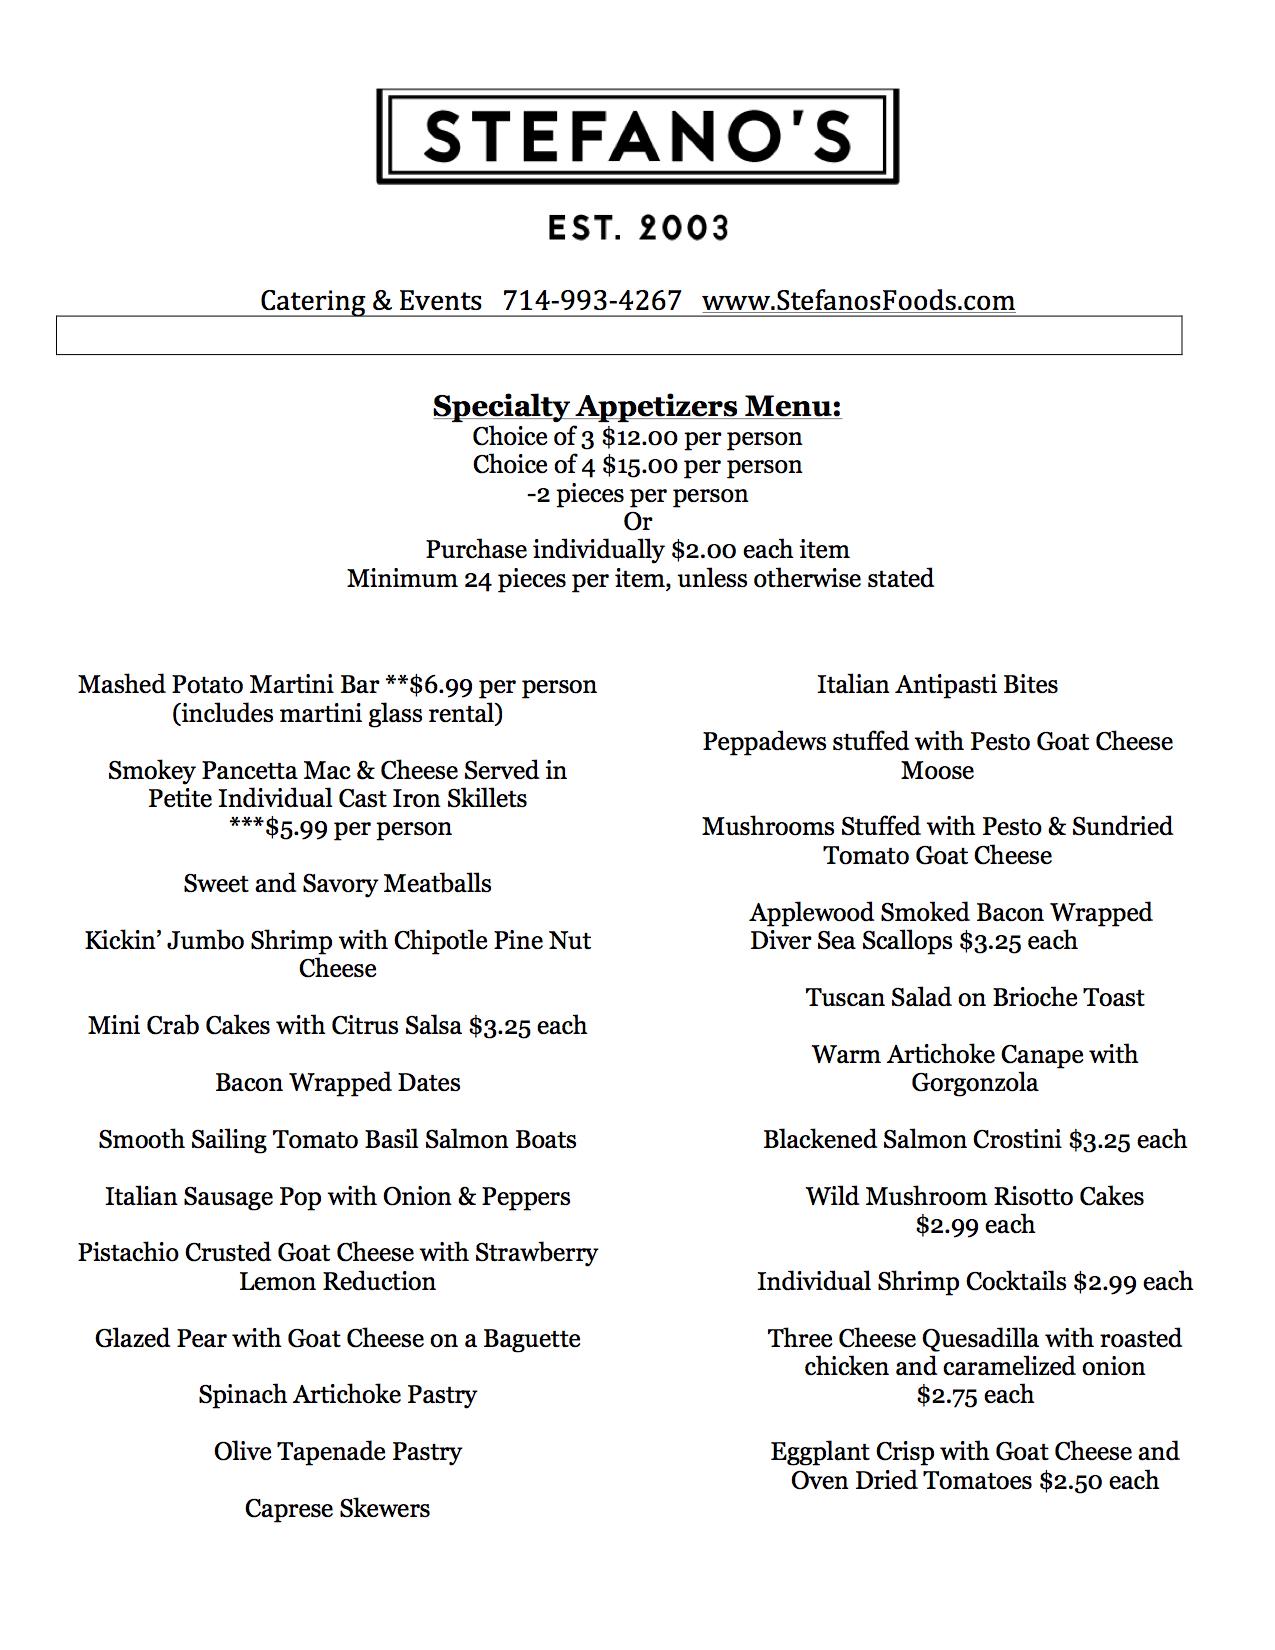 NEWSpecialty AppetizersMenu.jpg